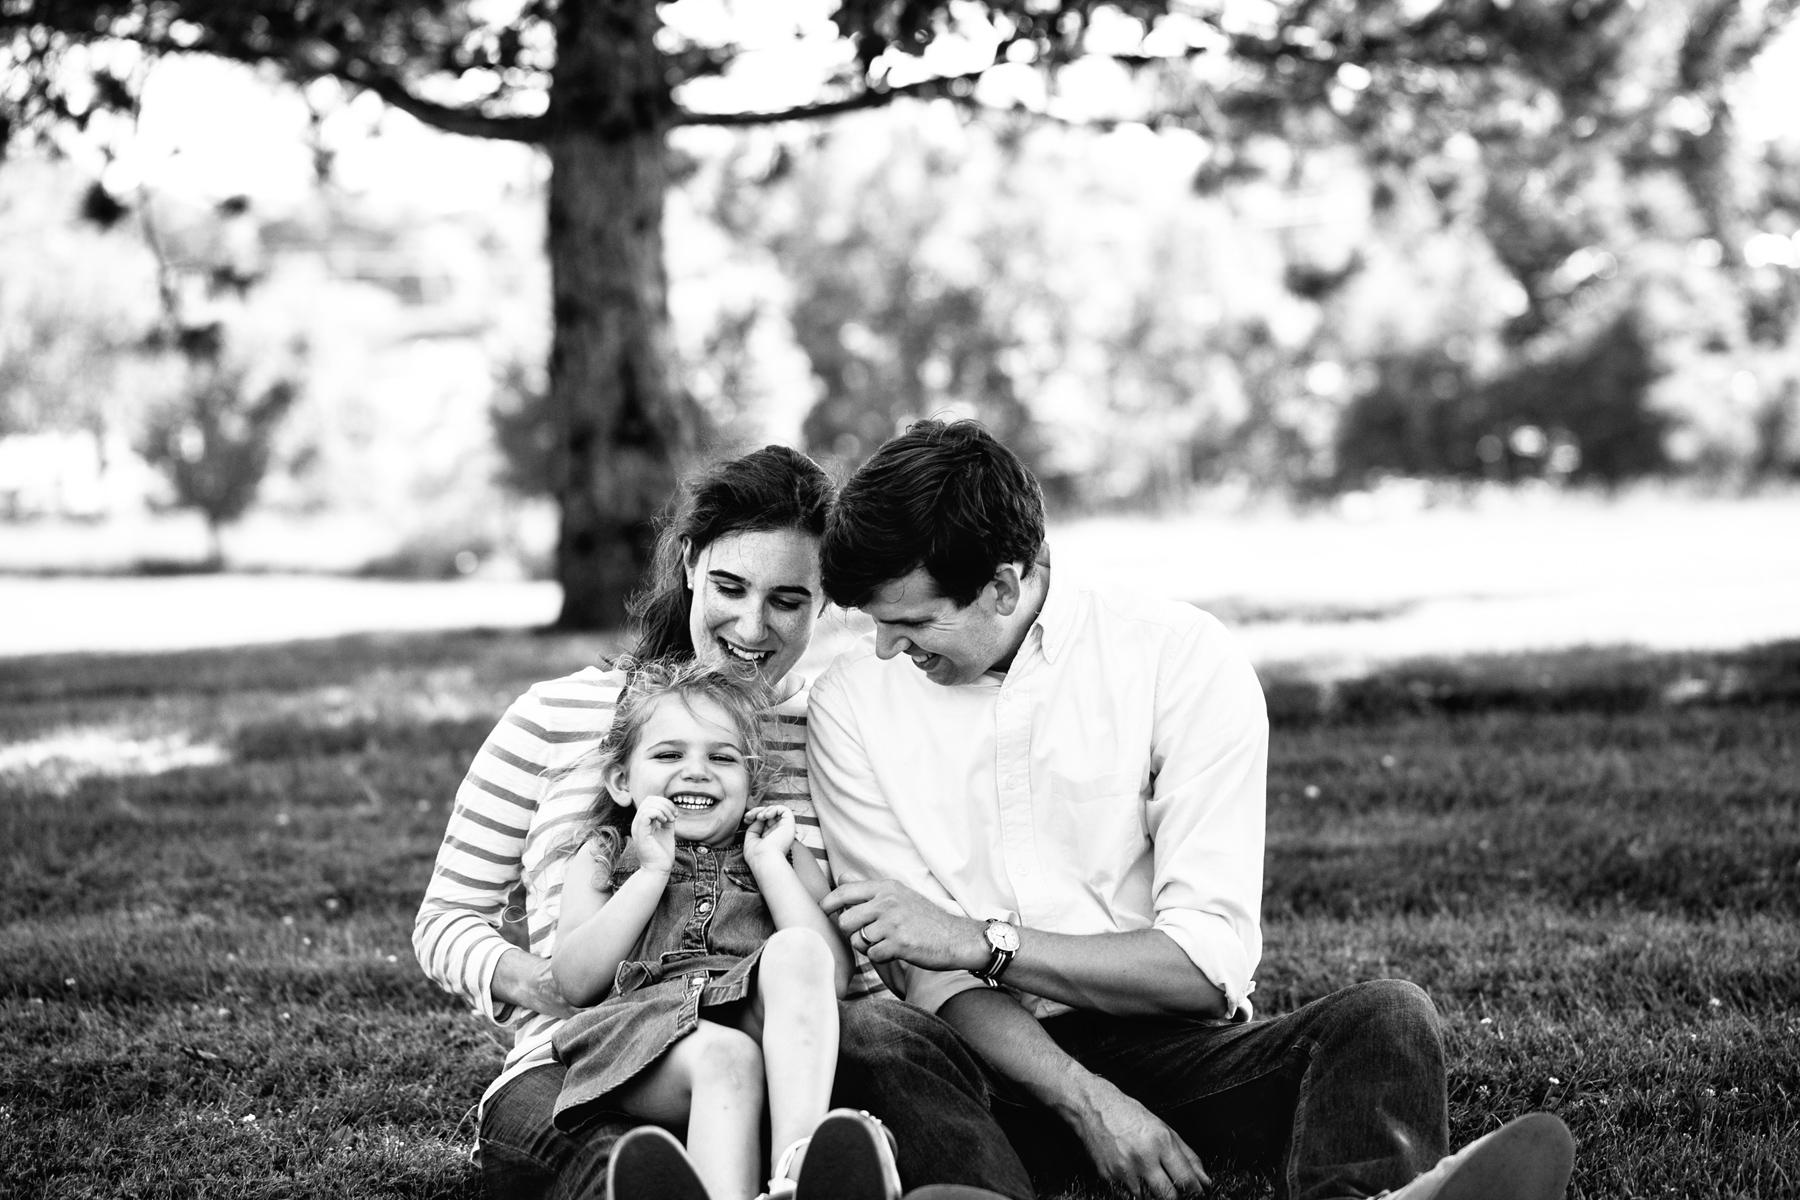 018-charlottetown-family-portraits-kandisebrown-rlk2016